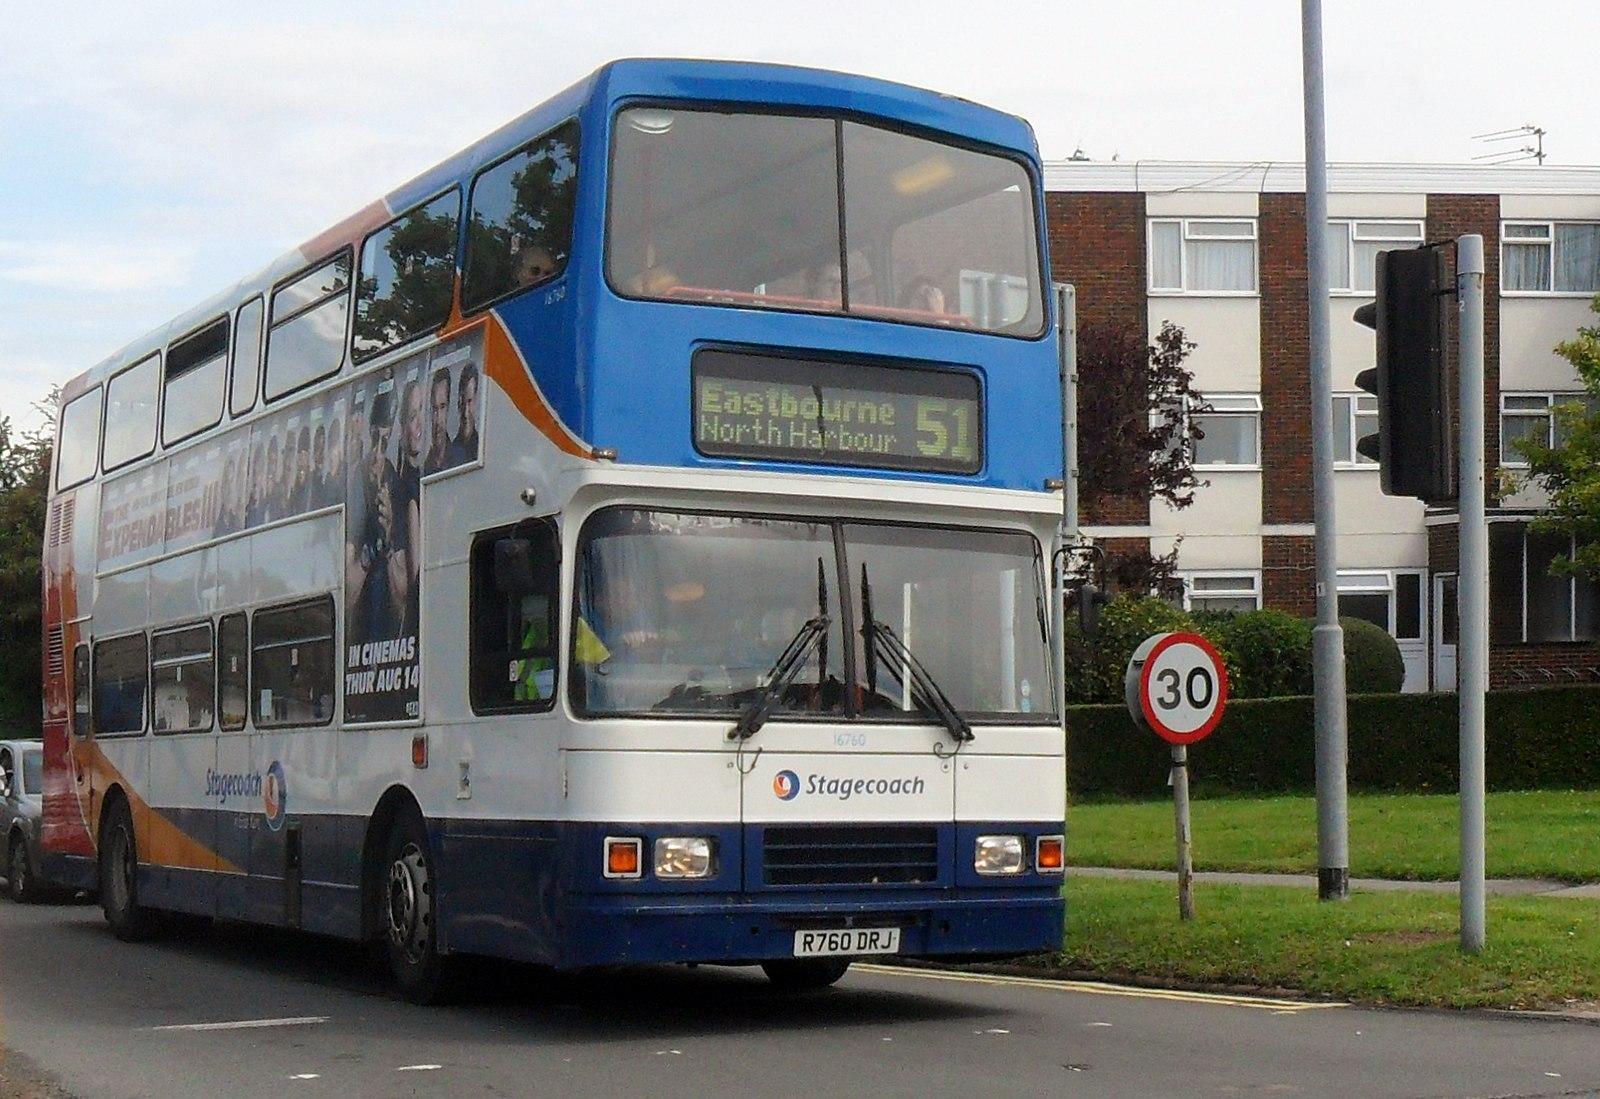 #AYearOfBuses 351: Heathfield – Eastbourne